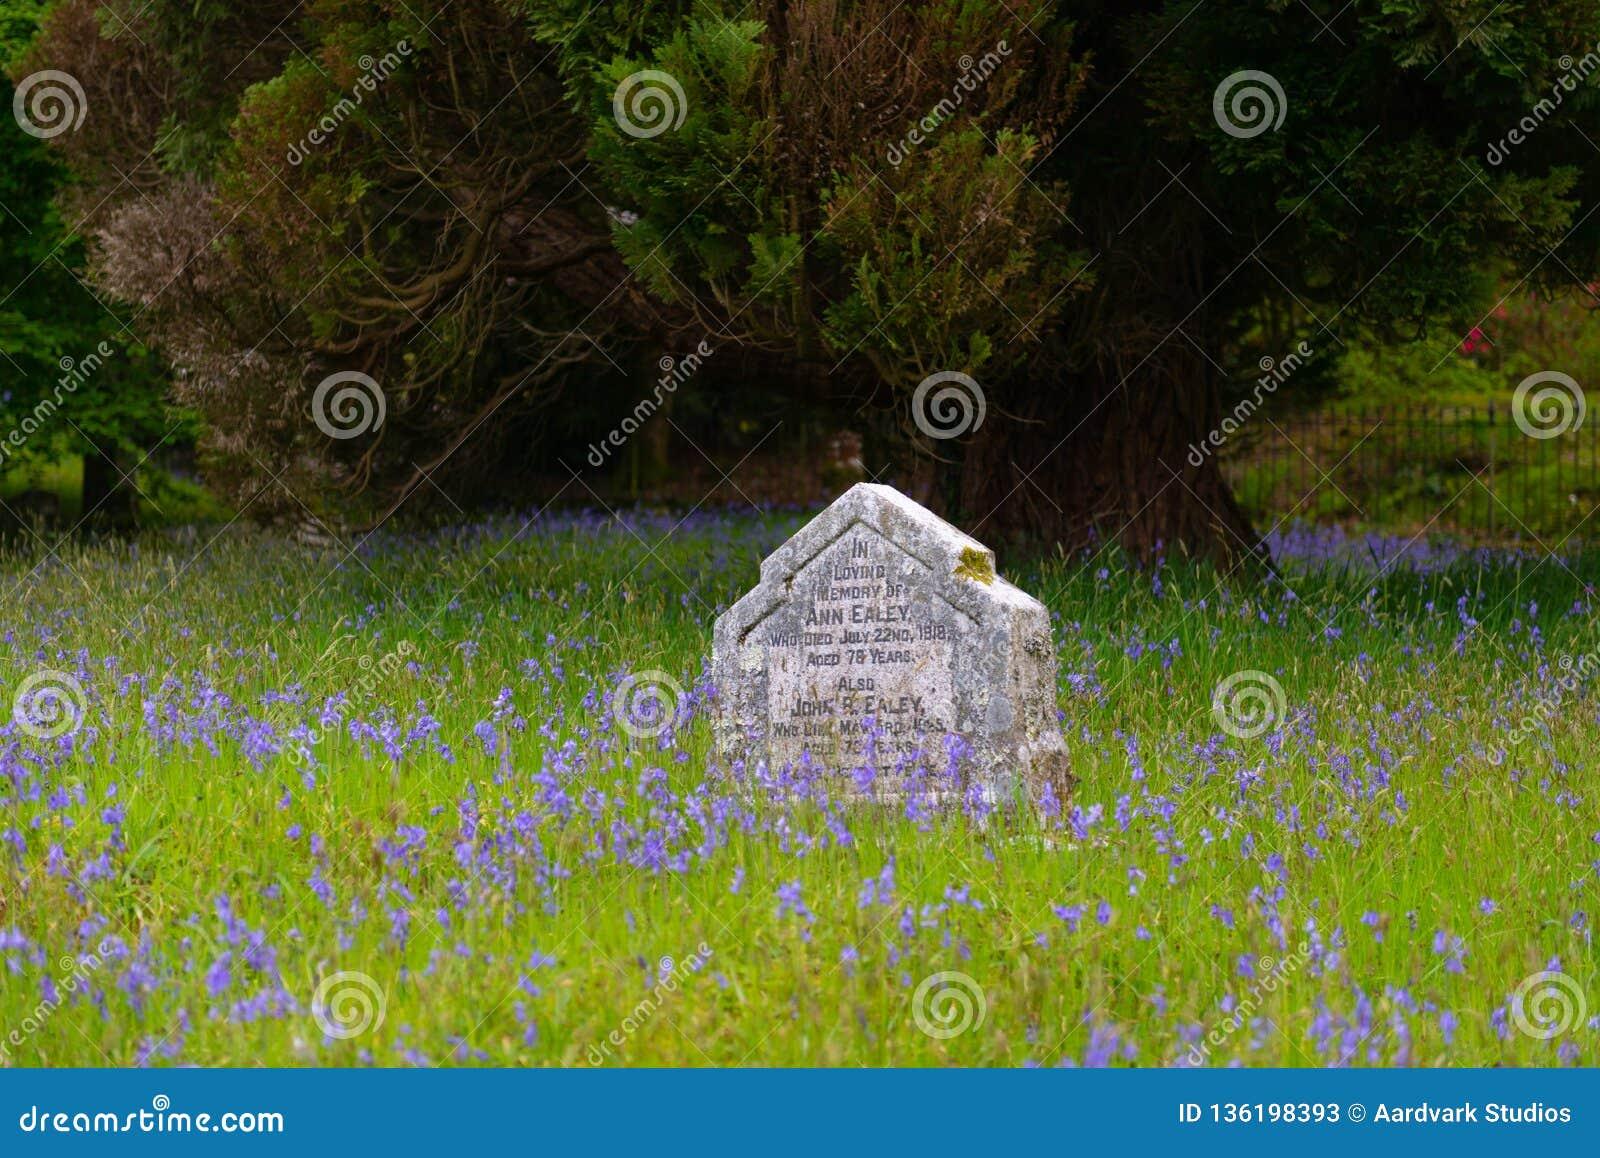 Gravestone in bluebells field